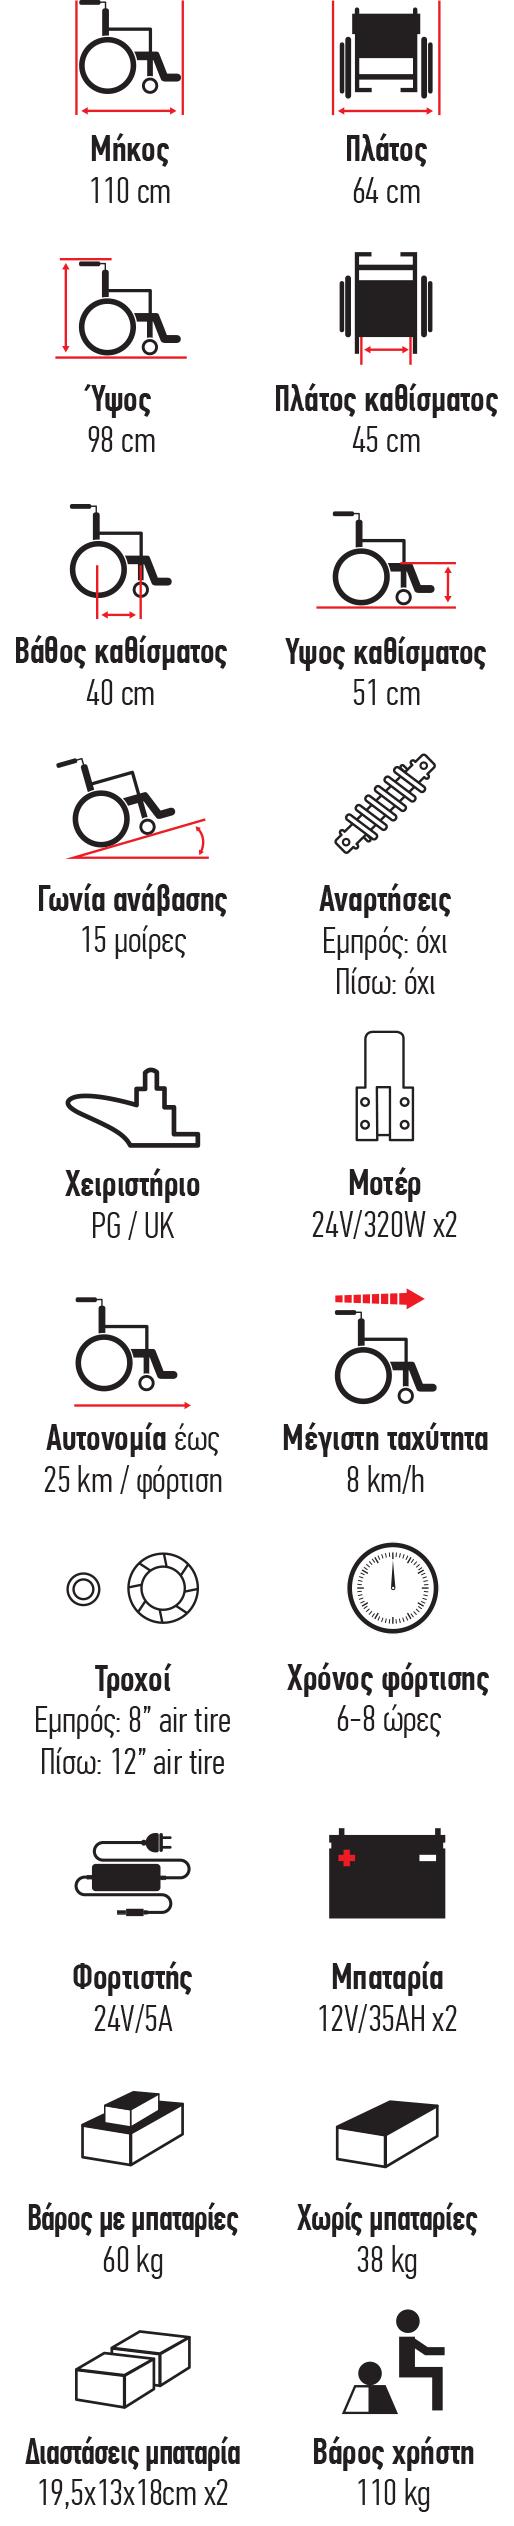 https://www.vita-orthopaedics.gr/Media/Default/1000x1000/09-2-015-1.png